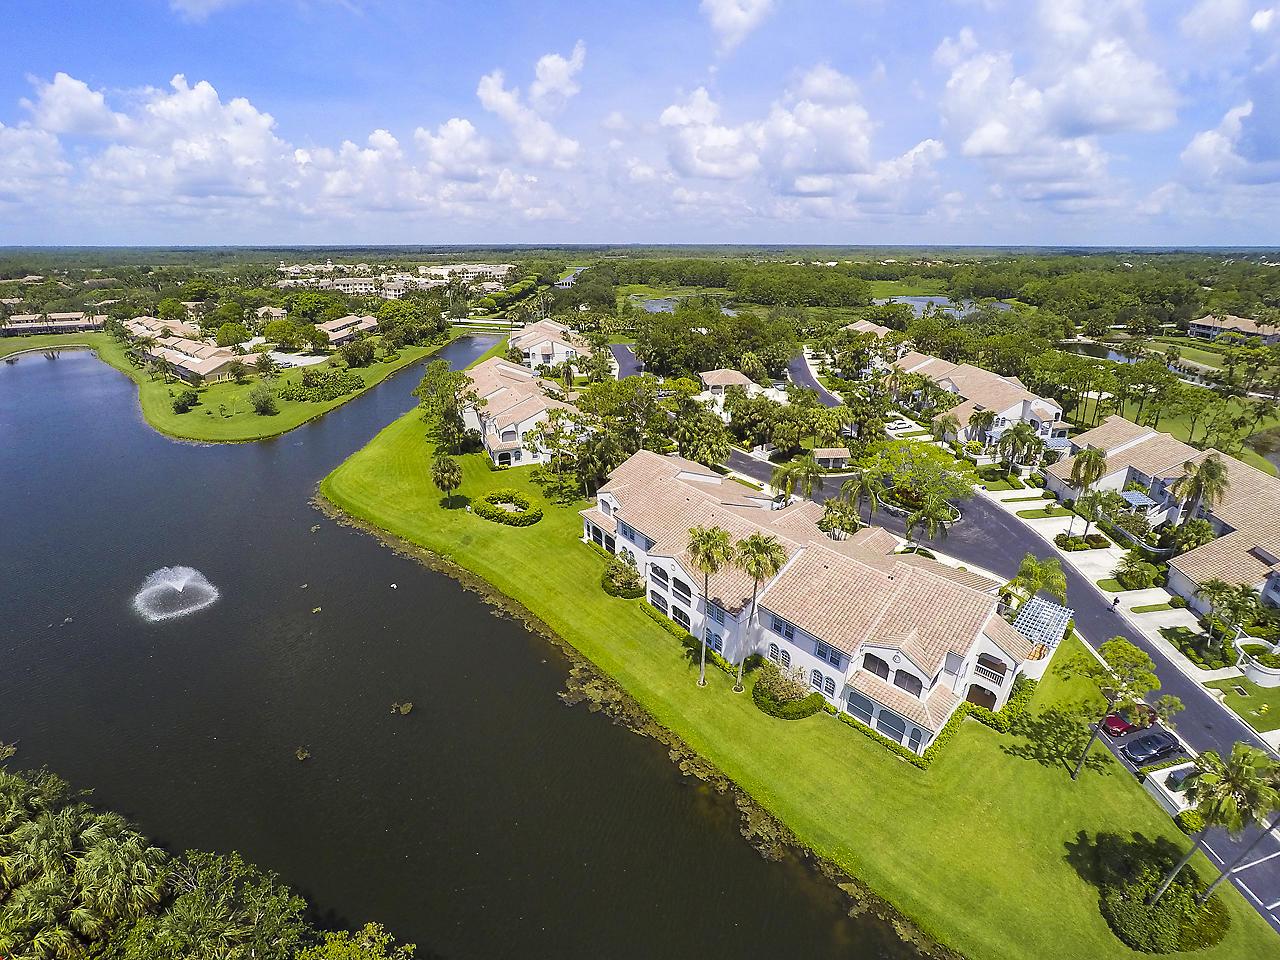 506 Ryder Cup Circle, Palm Beach Gardens, Florida 33418, 3 Bedrooms Bedrooms, ,2 BathroomsBathrooms,A,Condominium,Ryder Cup,RX-10436491